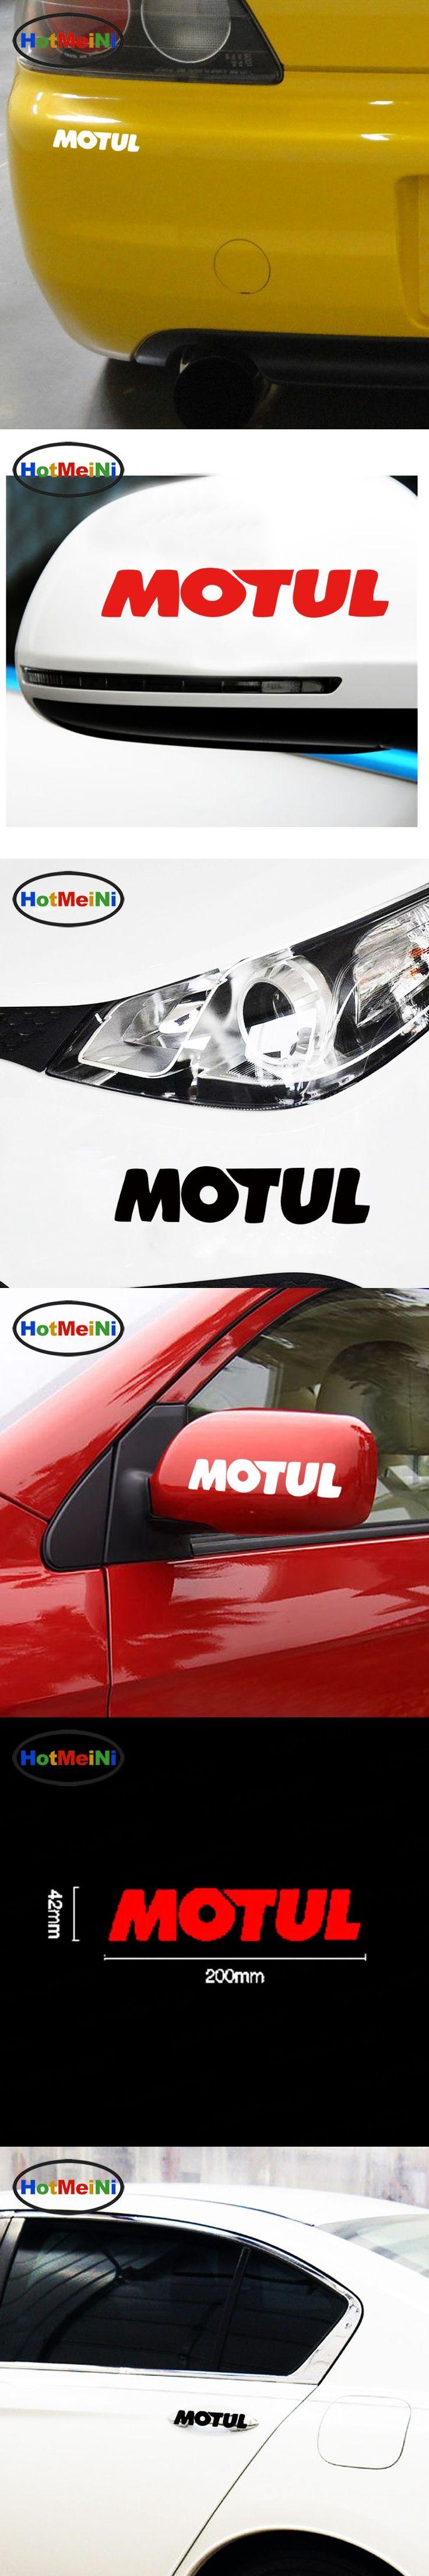 HotMeiNi 20*4.2cm Hot Sale Cool Motul Oil Body Stickers Car Sticker JDM vinyl Decal drop Car Styling Accessories Black/Sliver